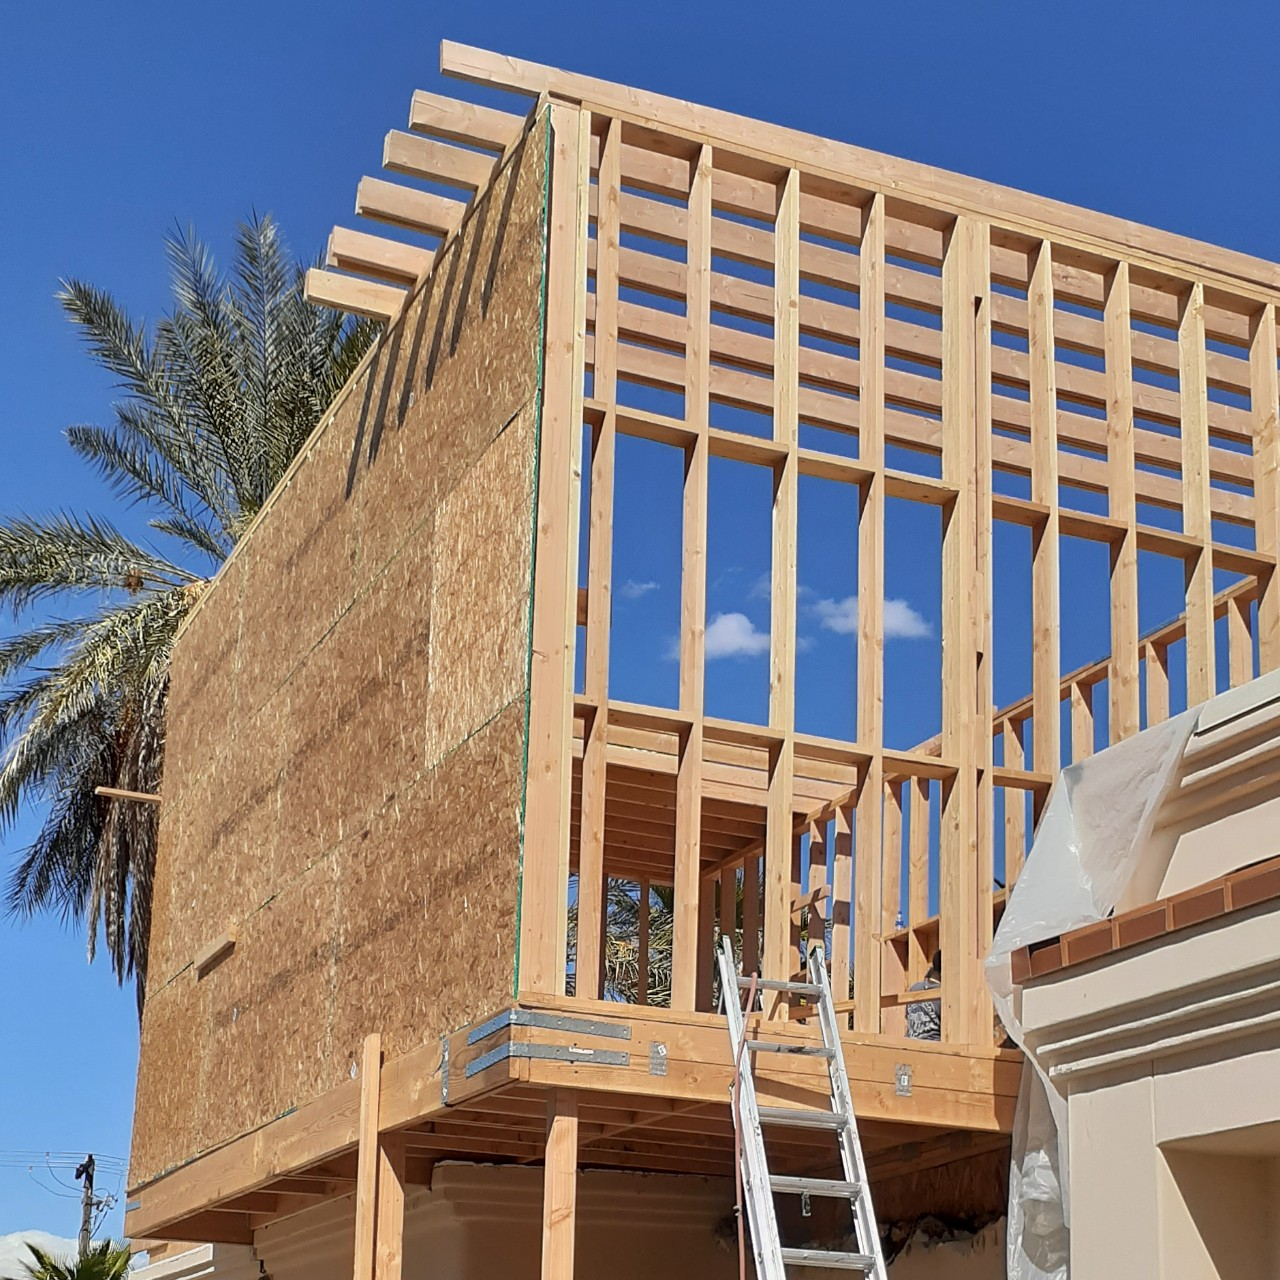 carpentry-wood-framing-second-floor-home-addition--framing-101